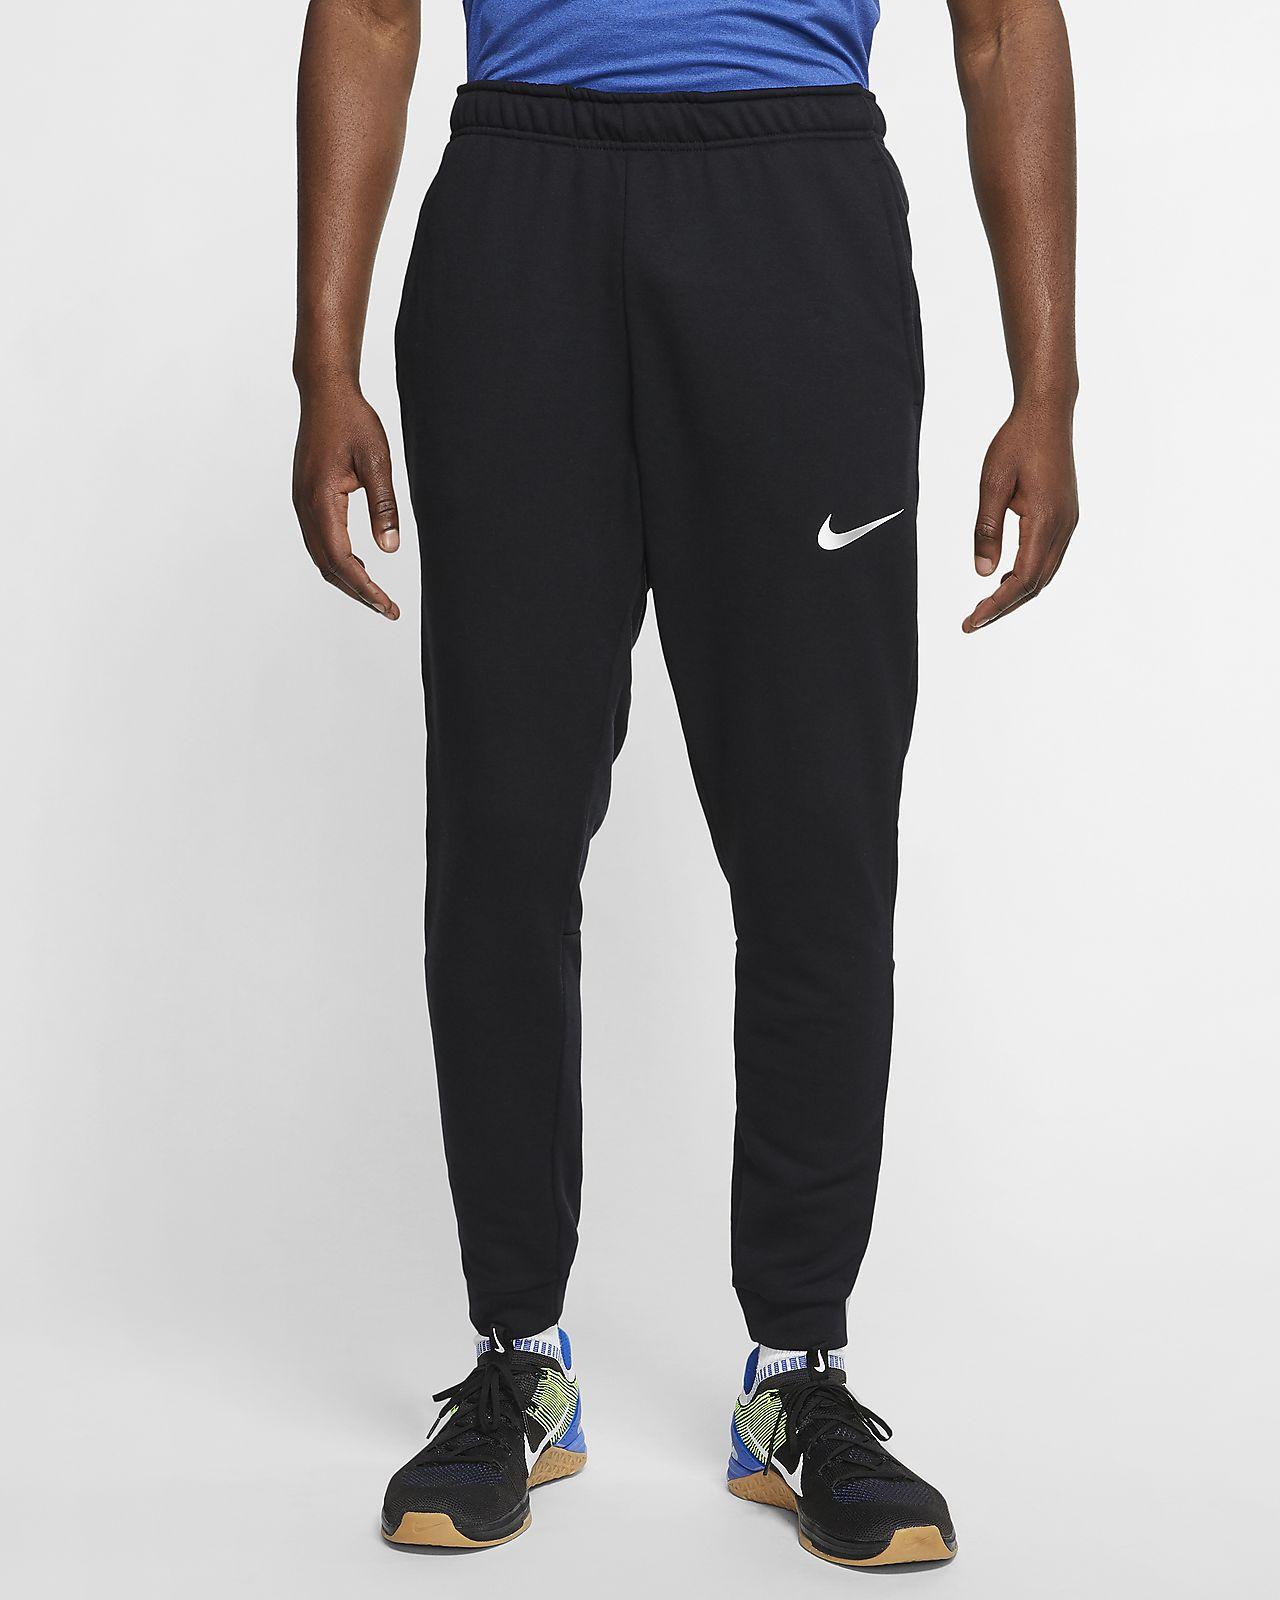 Nike Dri FIT Fleece Trainingshose für Herren